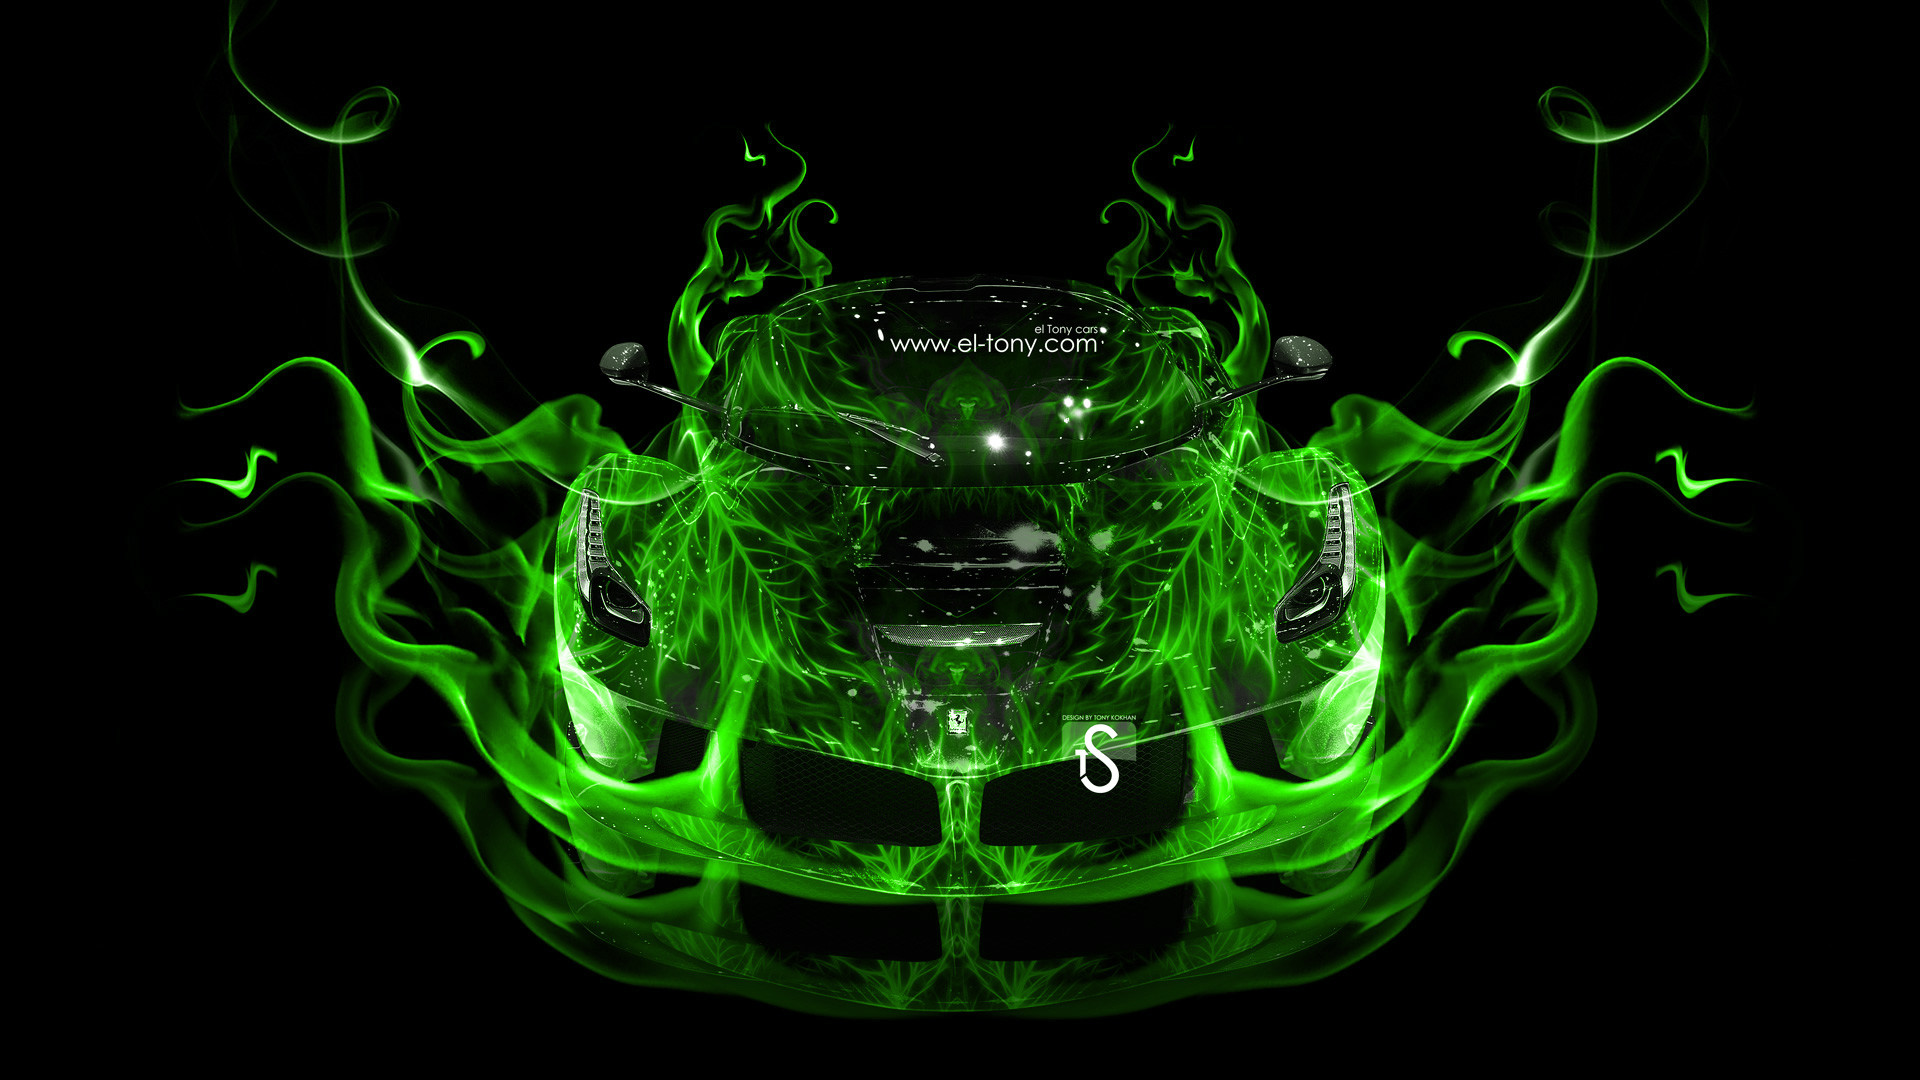 Ferrari-Laferrari-Green-Fire-Abstract-Car-2013-HD-